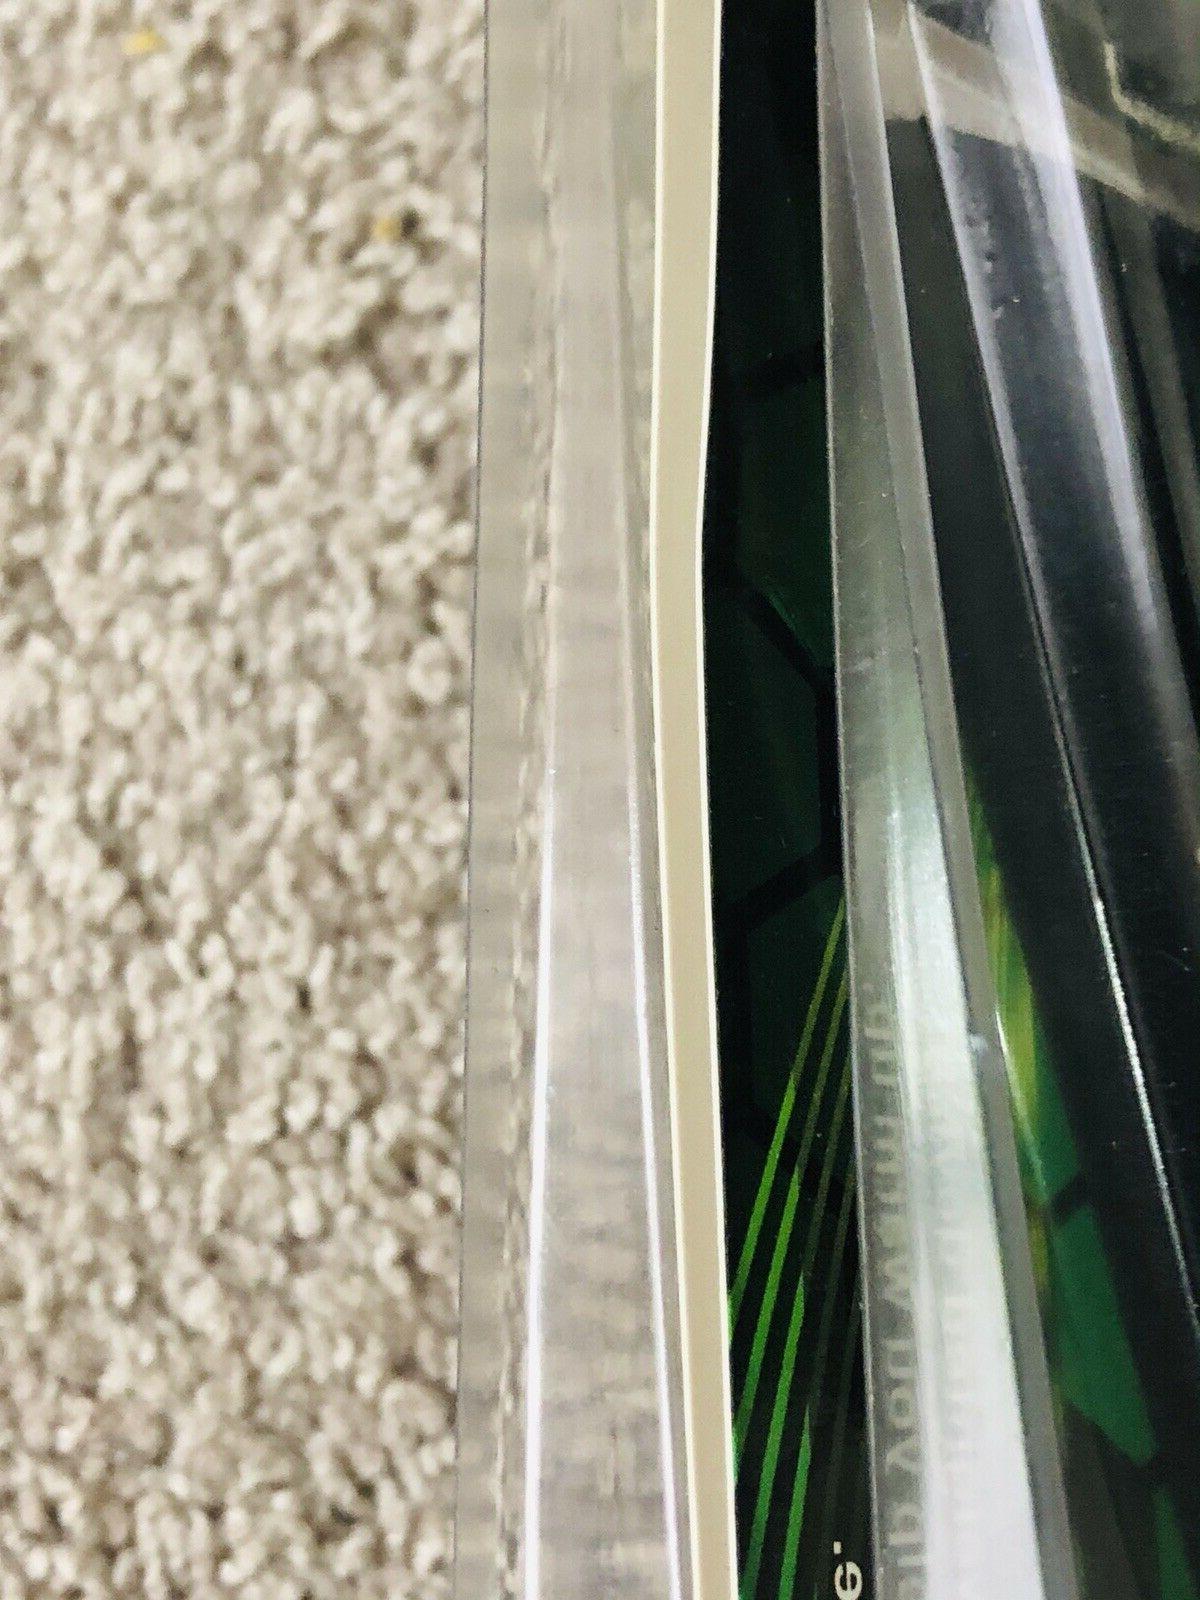 Tennis Racquet Aid packing damage